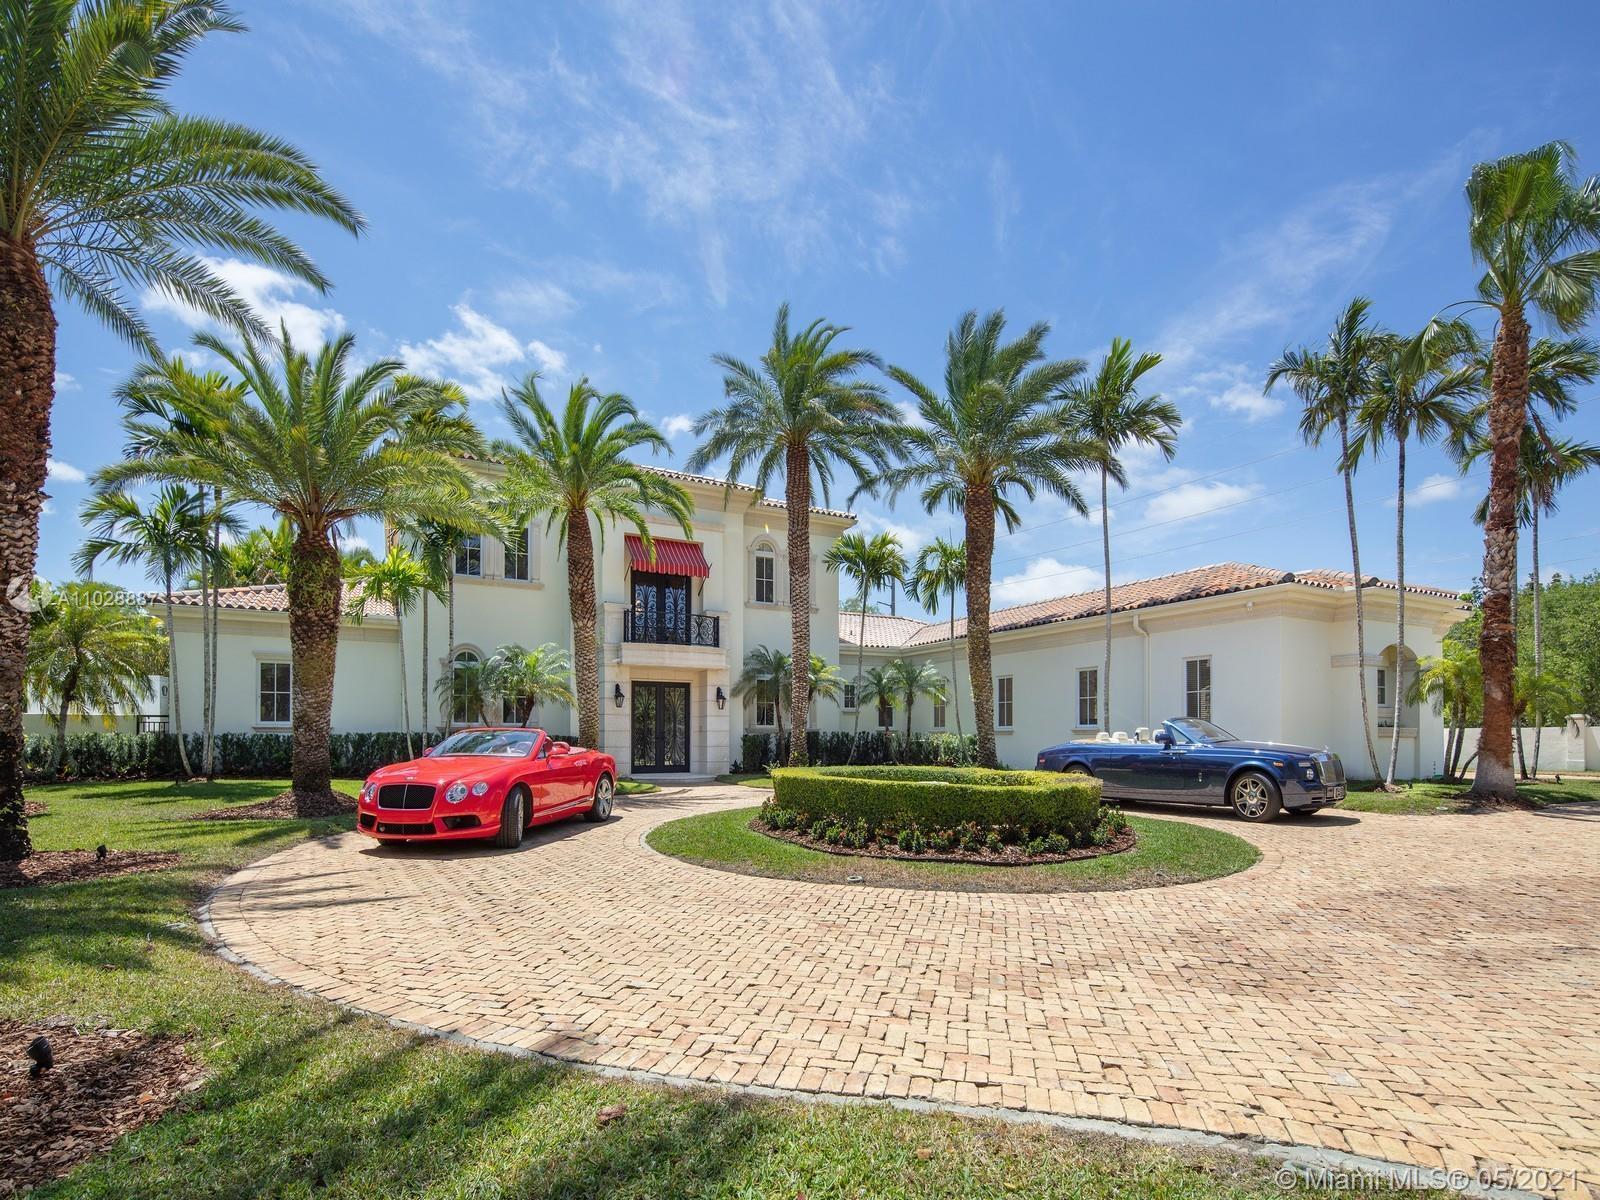 Impressive one acre + custom estate located in Prime North Pinecrest. This magnificent 11,046 sf hom